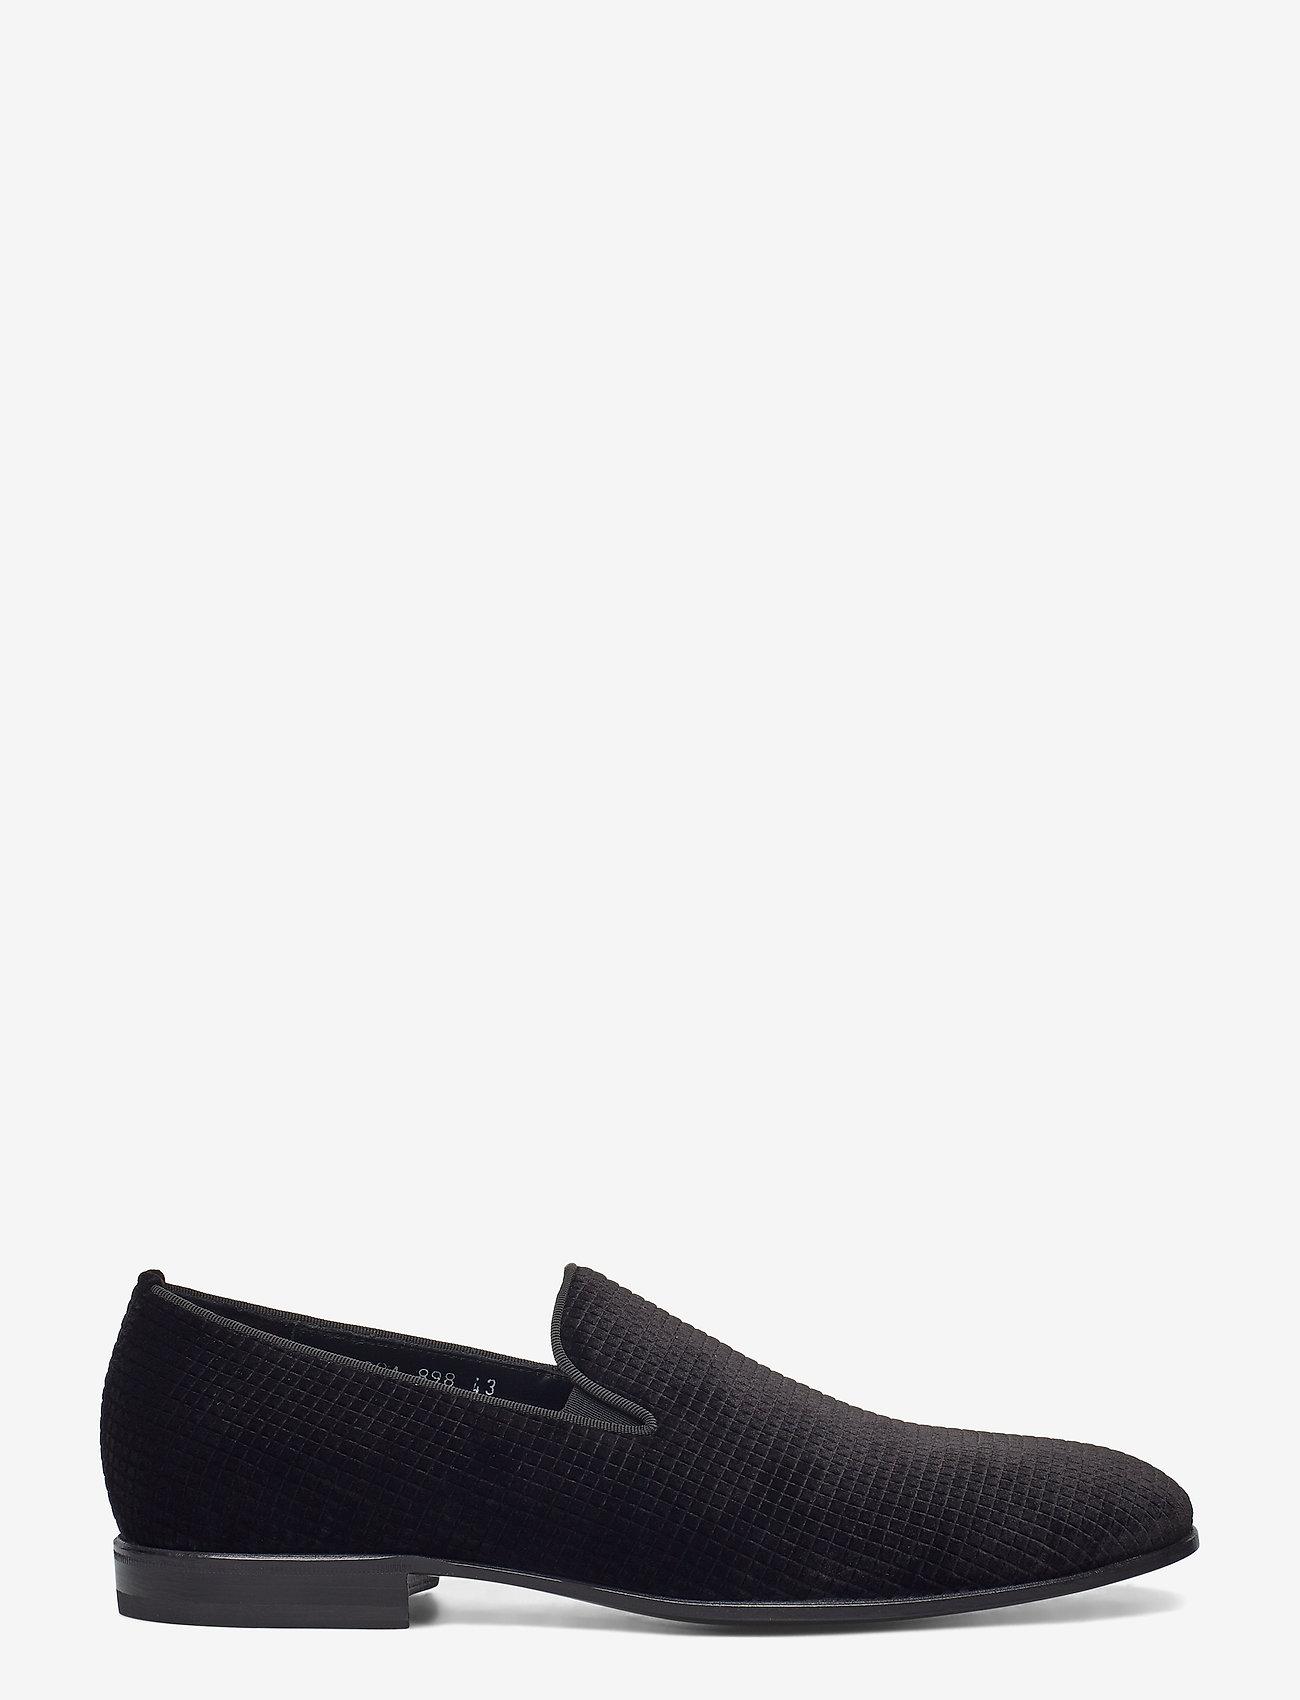 SAND - Footwear MW - F898 - loafers - black - 1